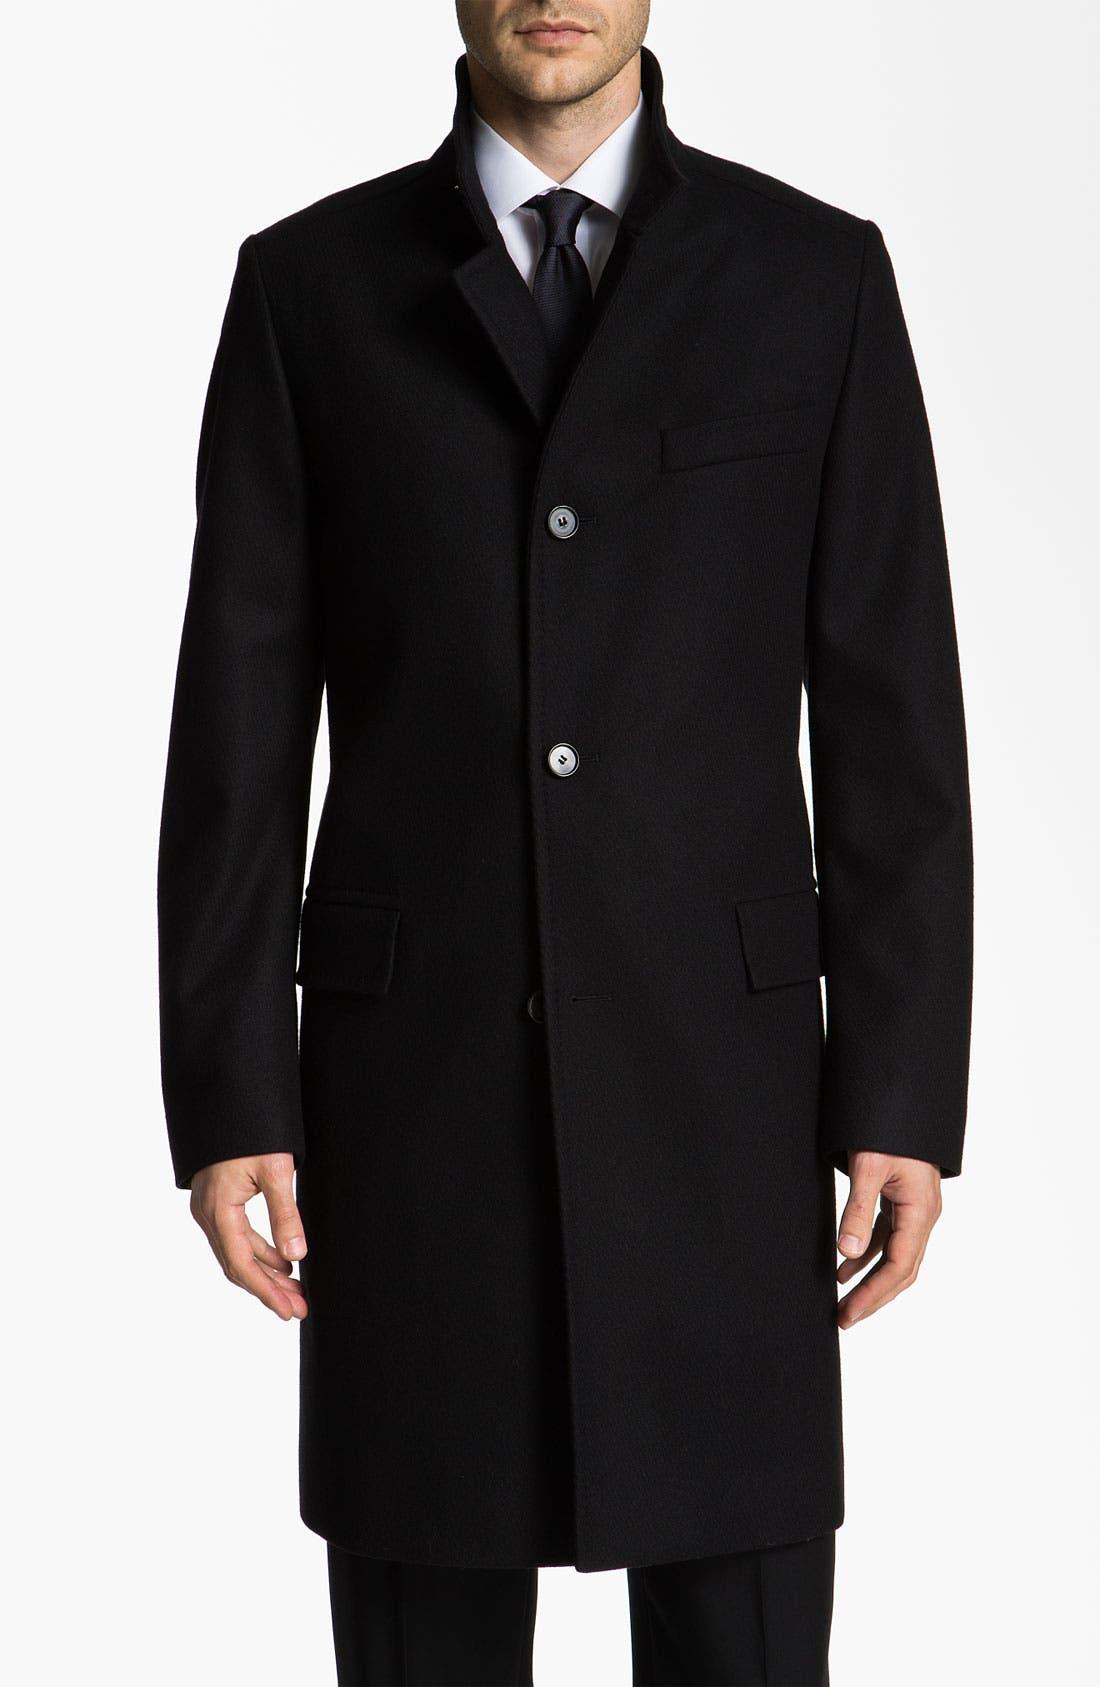 Alternate Image 1 Selected - BOSS Black 'Sintrax' Top Coat